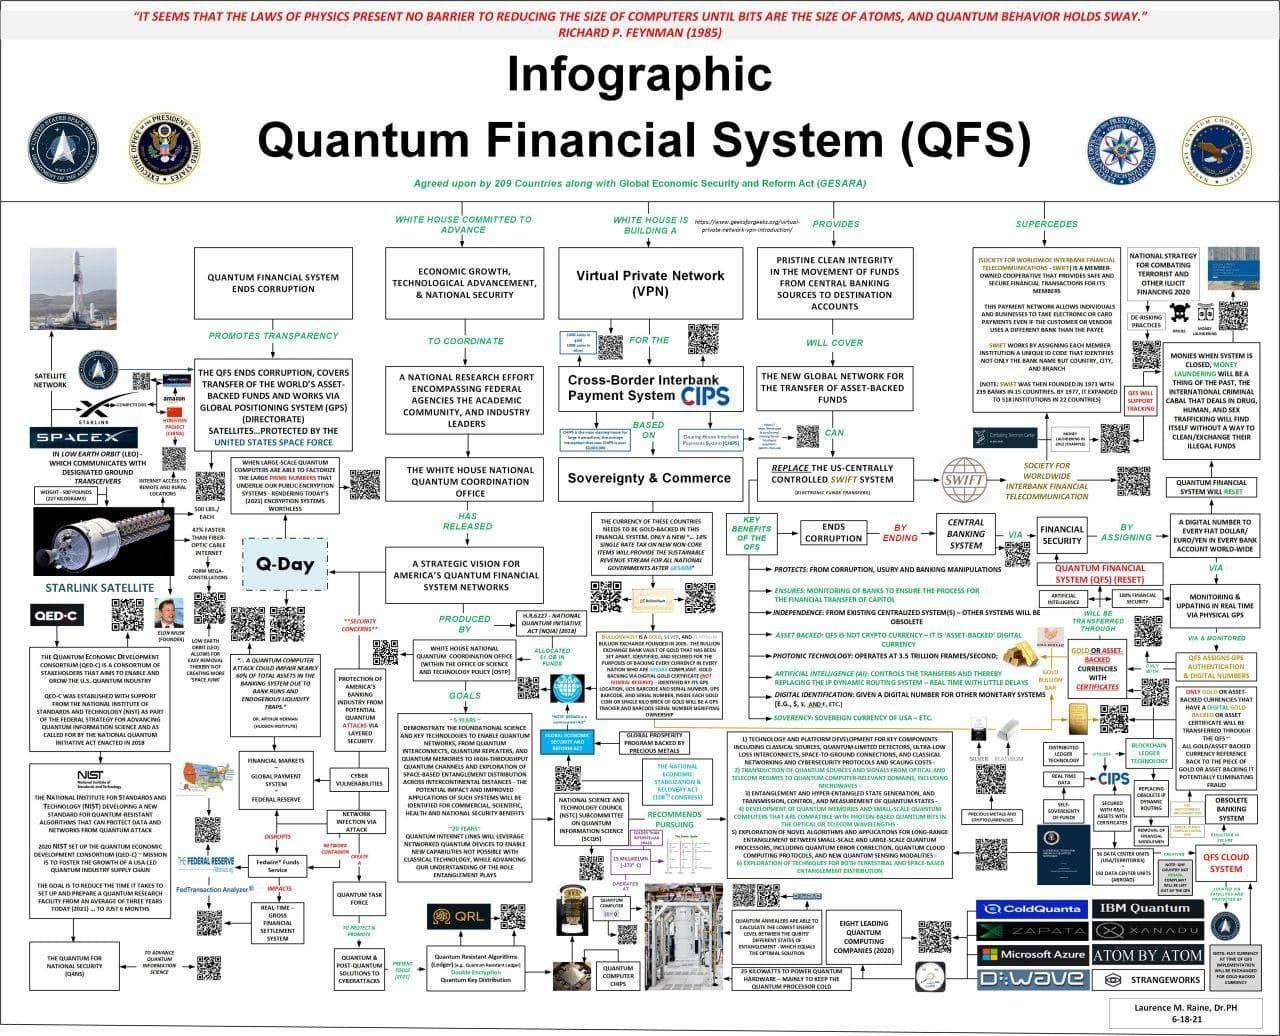 QFS - Quantum Financial System - Quantum Finanz System